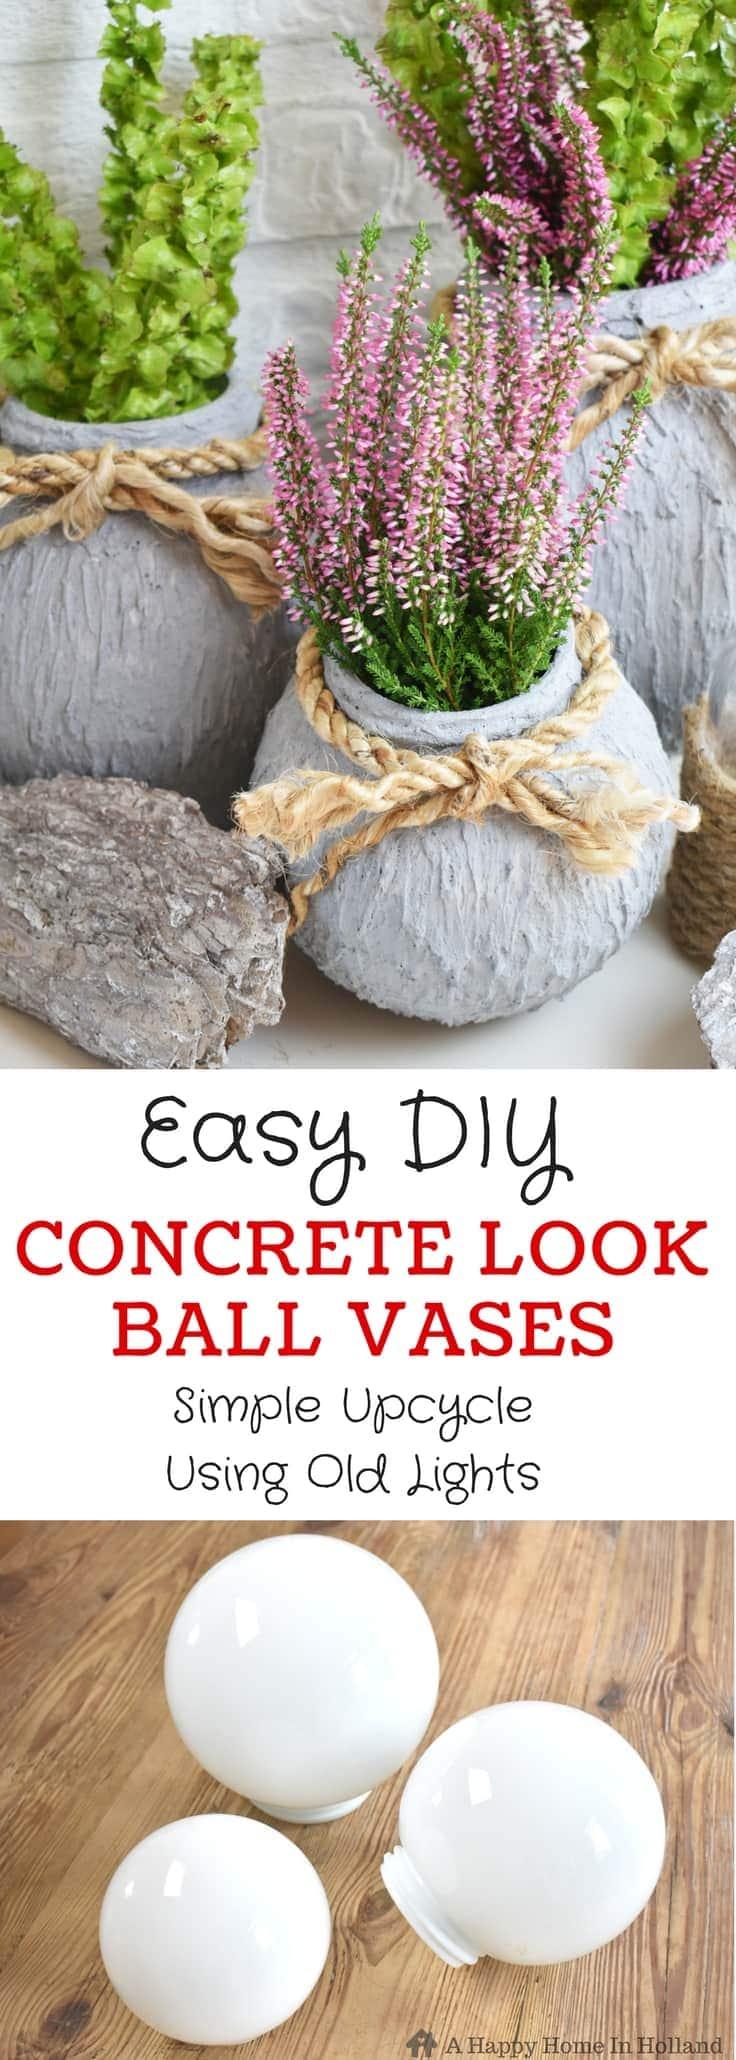 Easy DIY Concrete Look Ball Vases